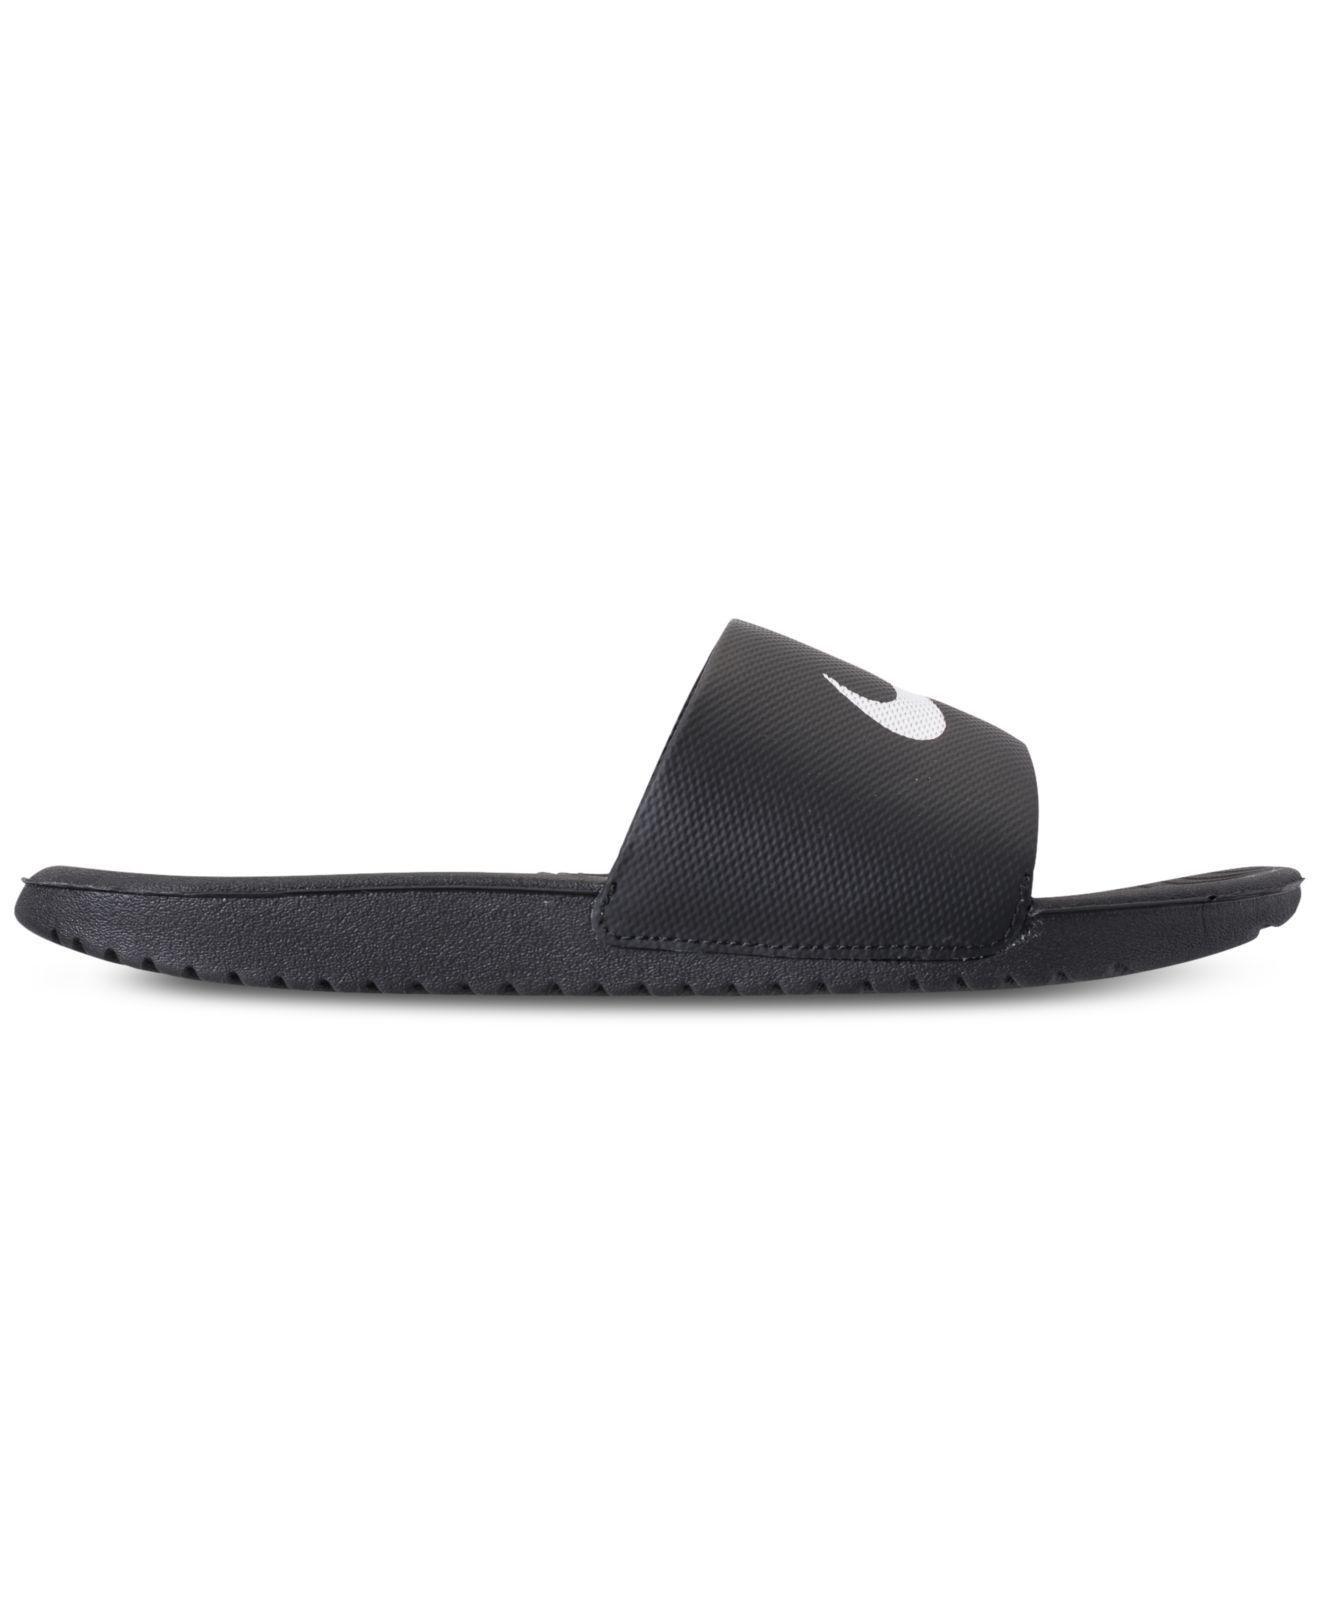 ec2addb02693 Lyst - Nike Kawa Slide Sandals From Finish Line in Black for Men